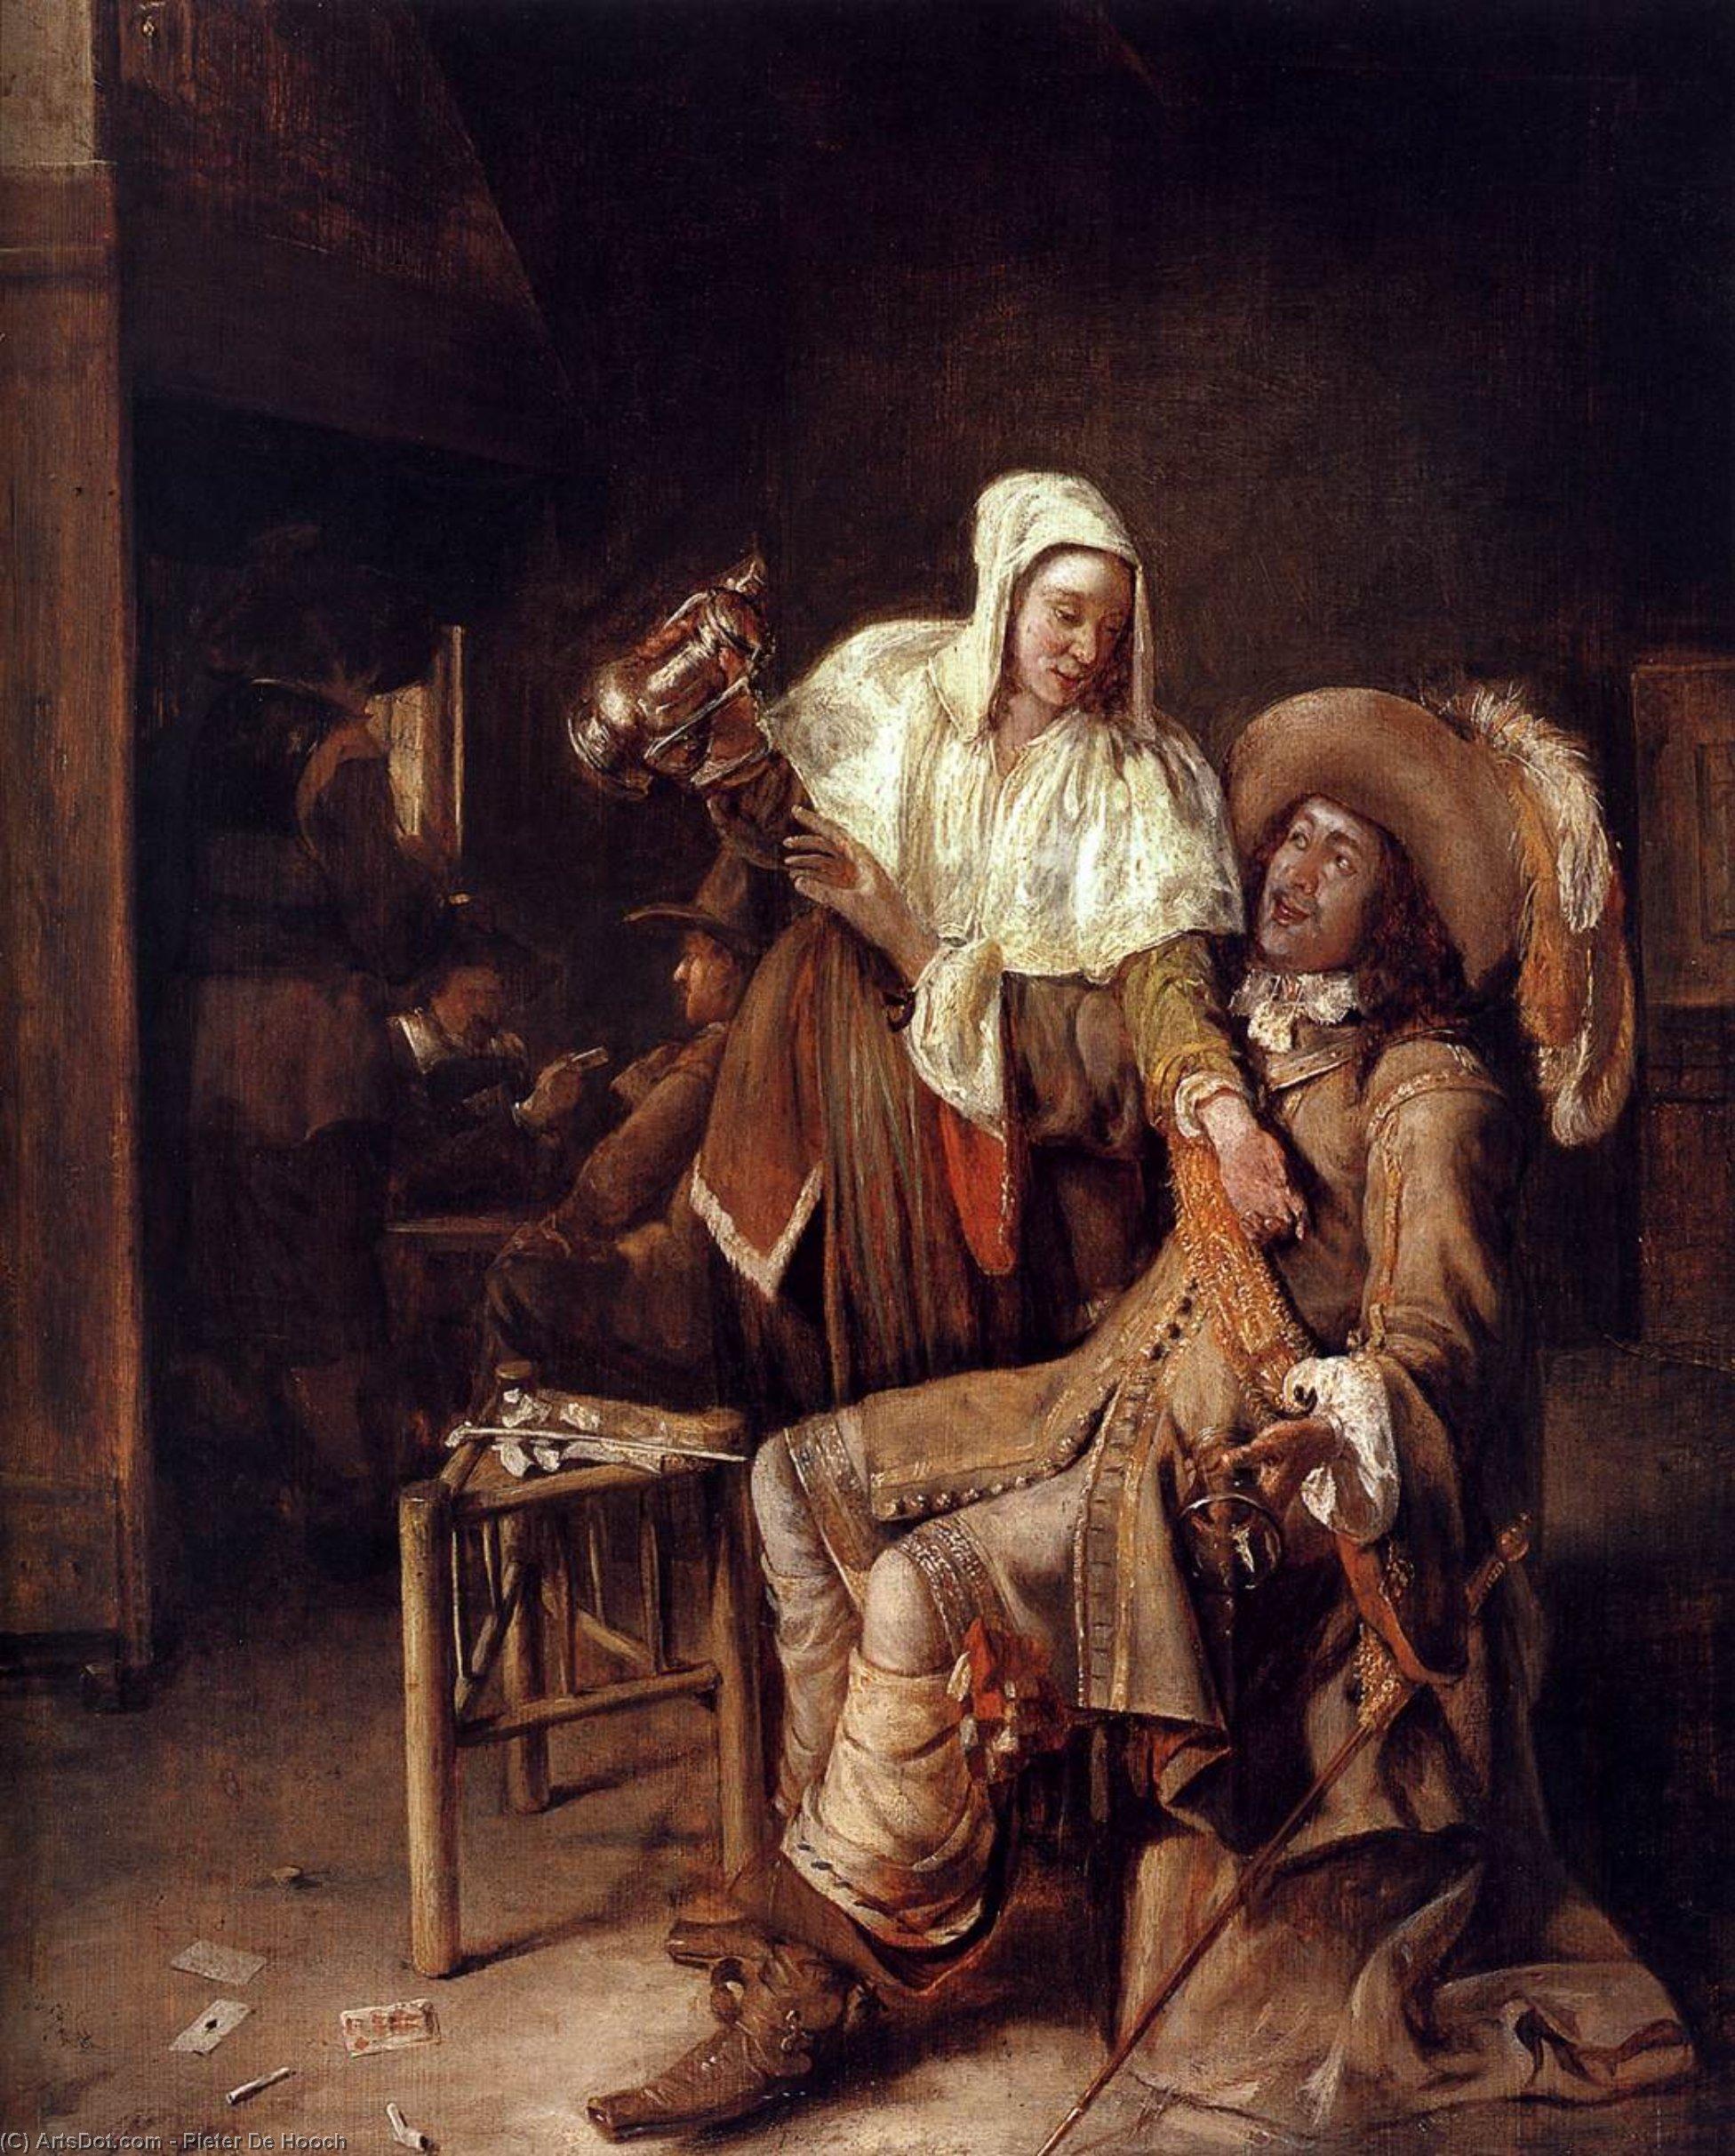 Wikioo.org - The Encyclopedia of Fine Arts - Painting, Artwork by Pieter De Hooch - The Empty Glass